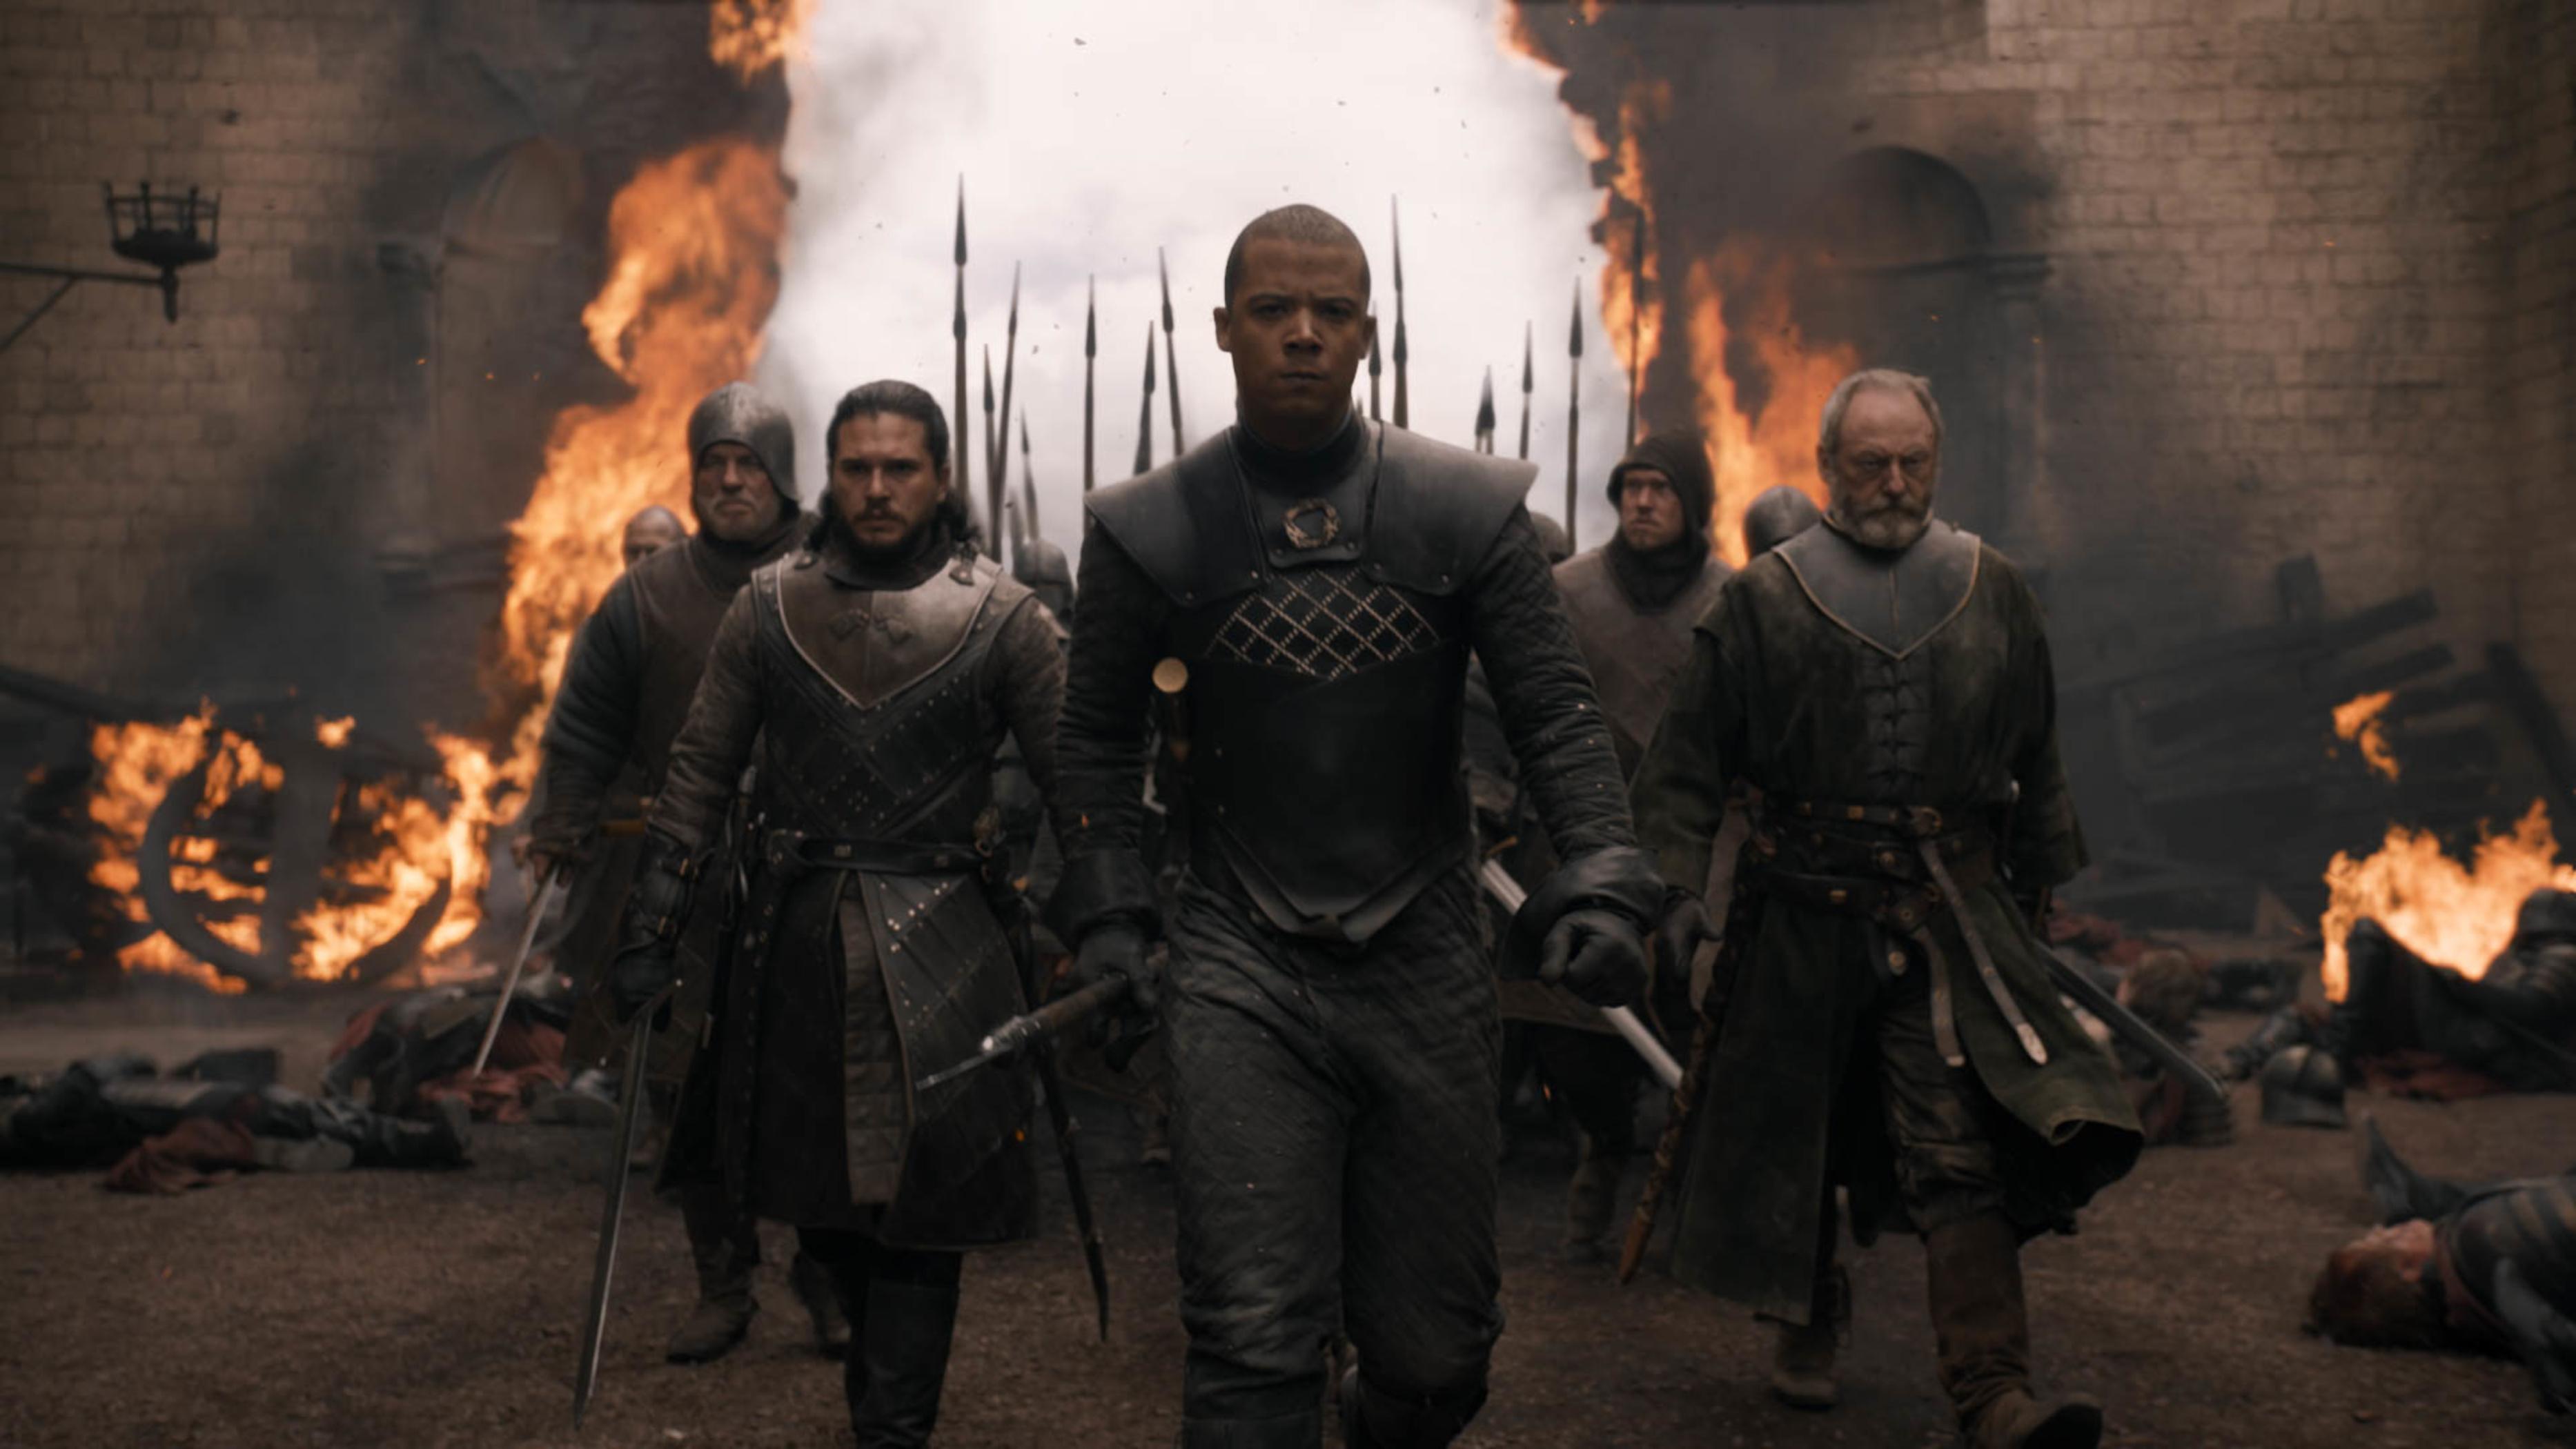 download game of thrones season 8 episode 5 reddit